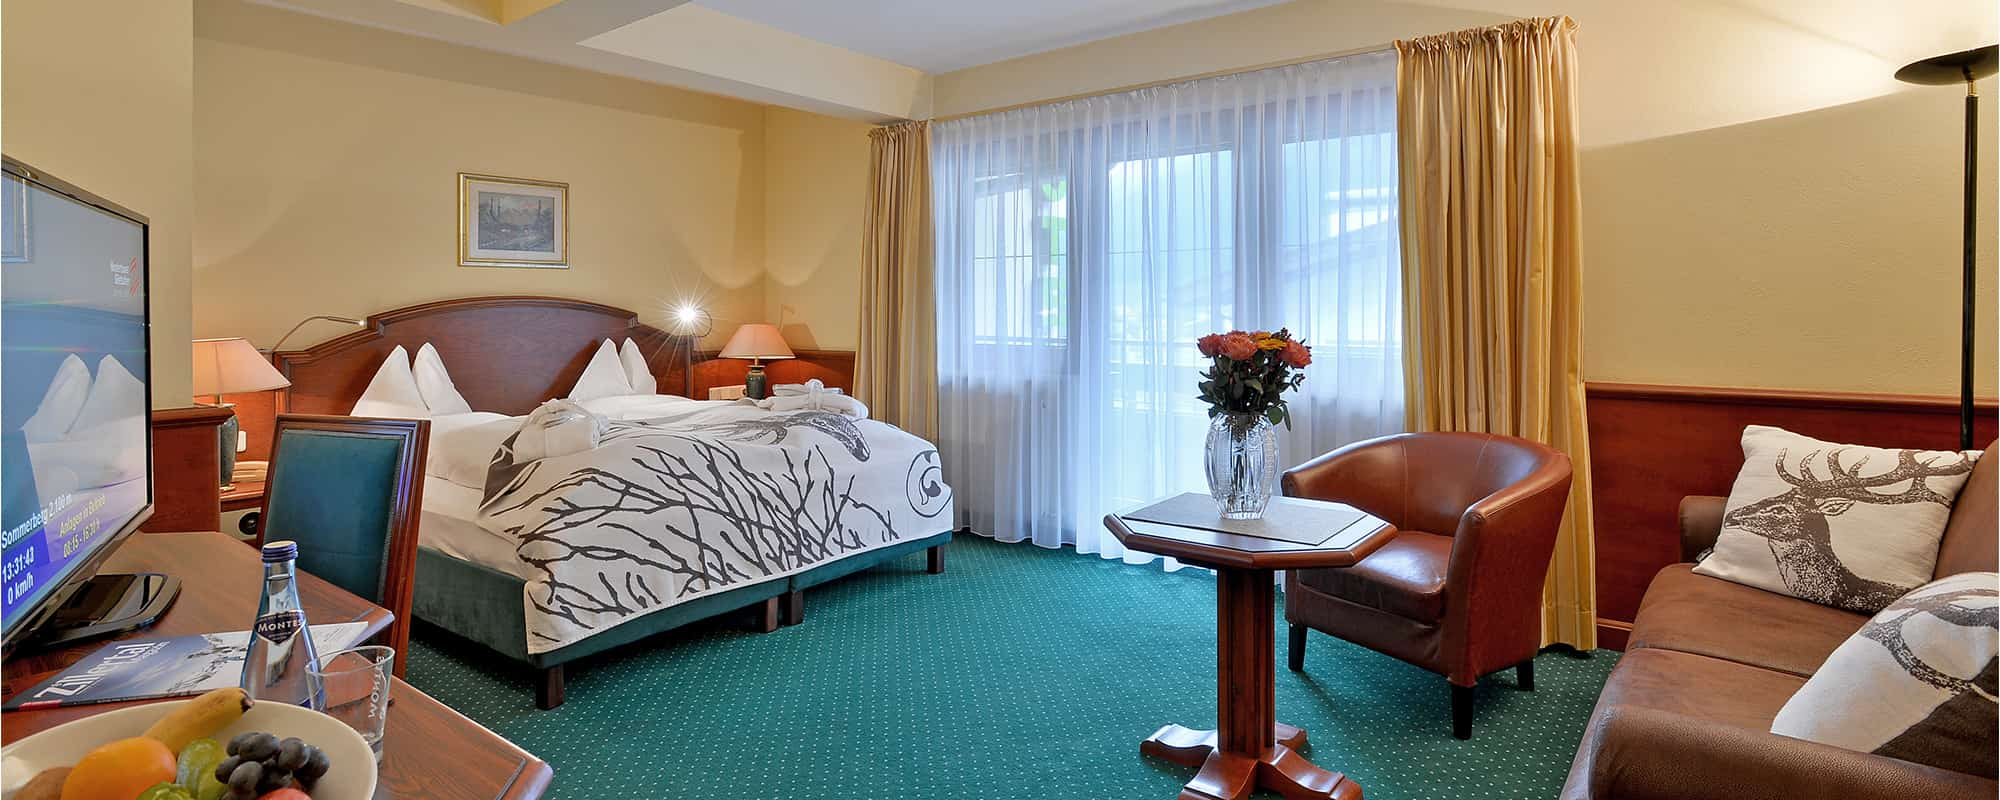 MANNI Classic Room doppelbett mit ausblick